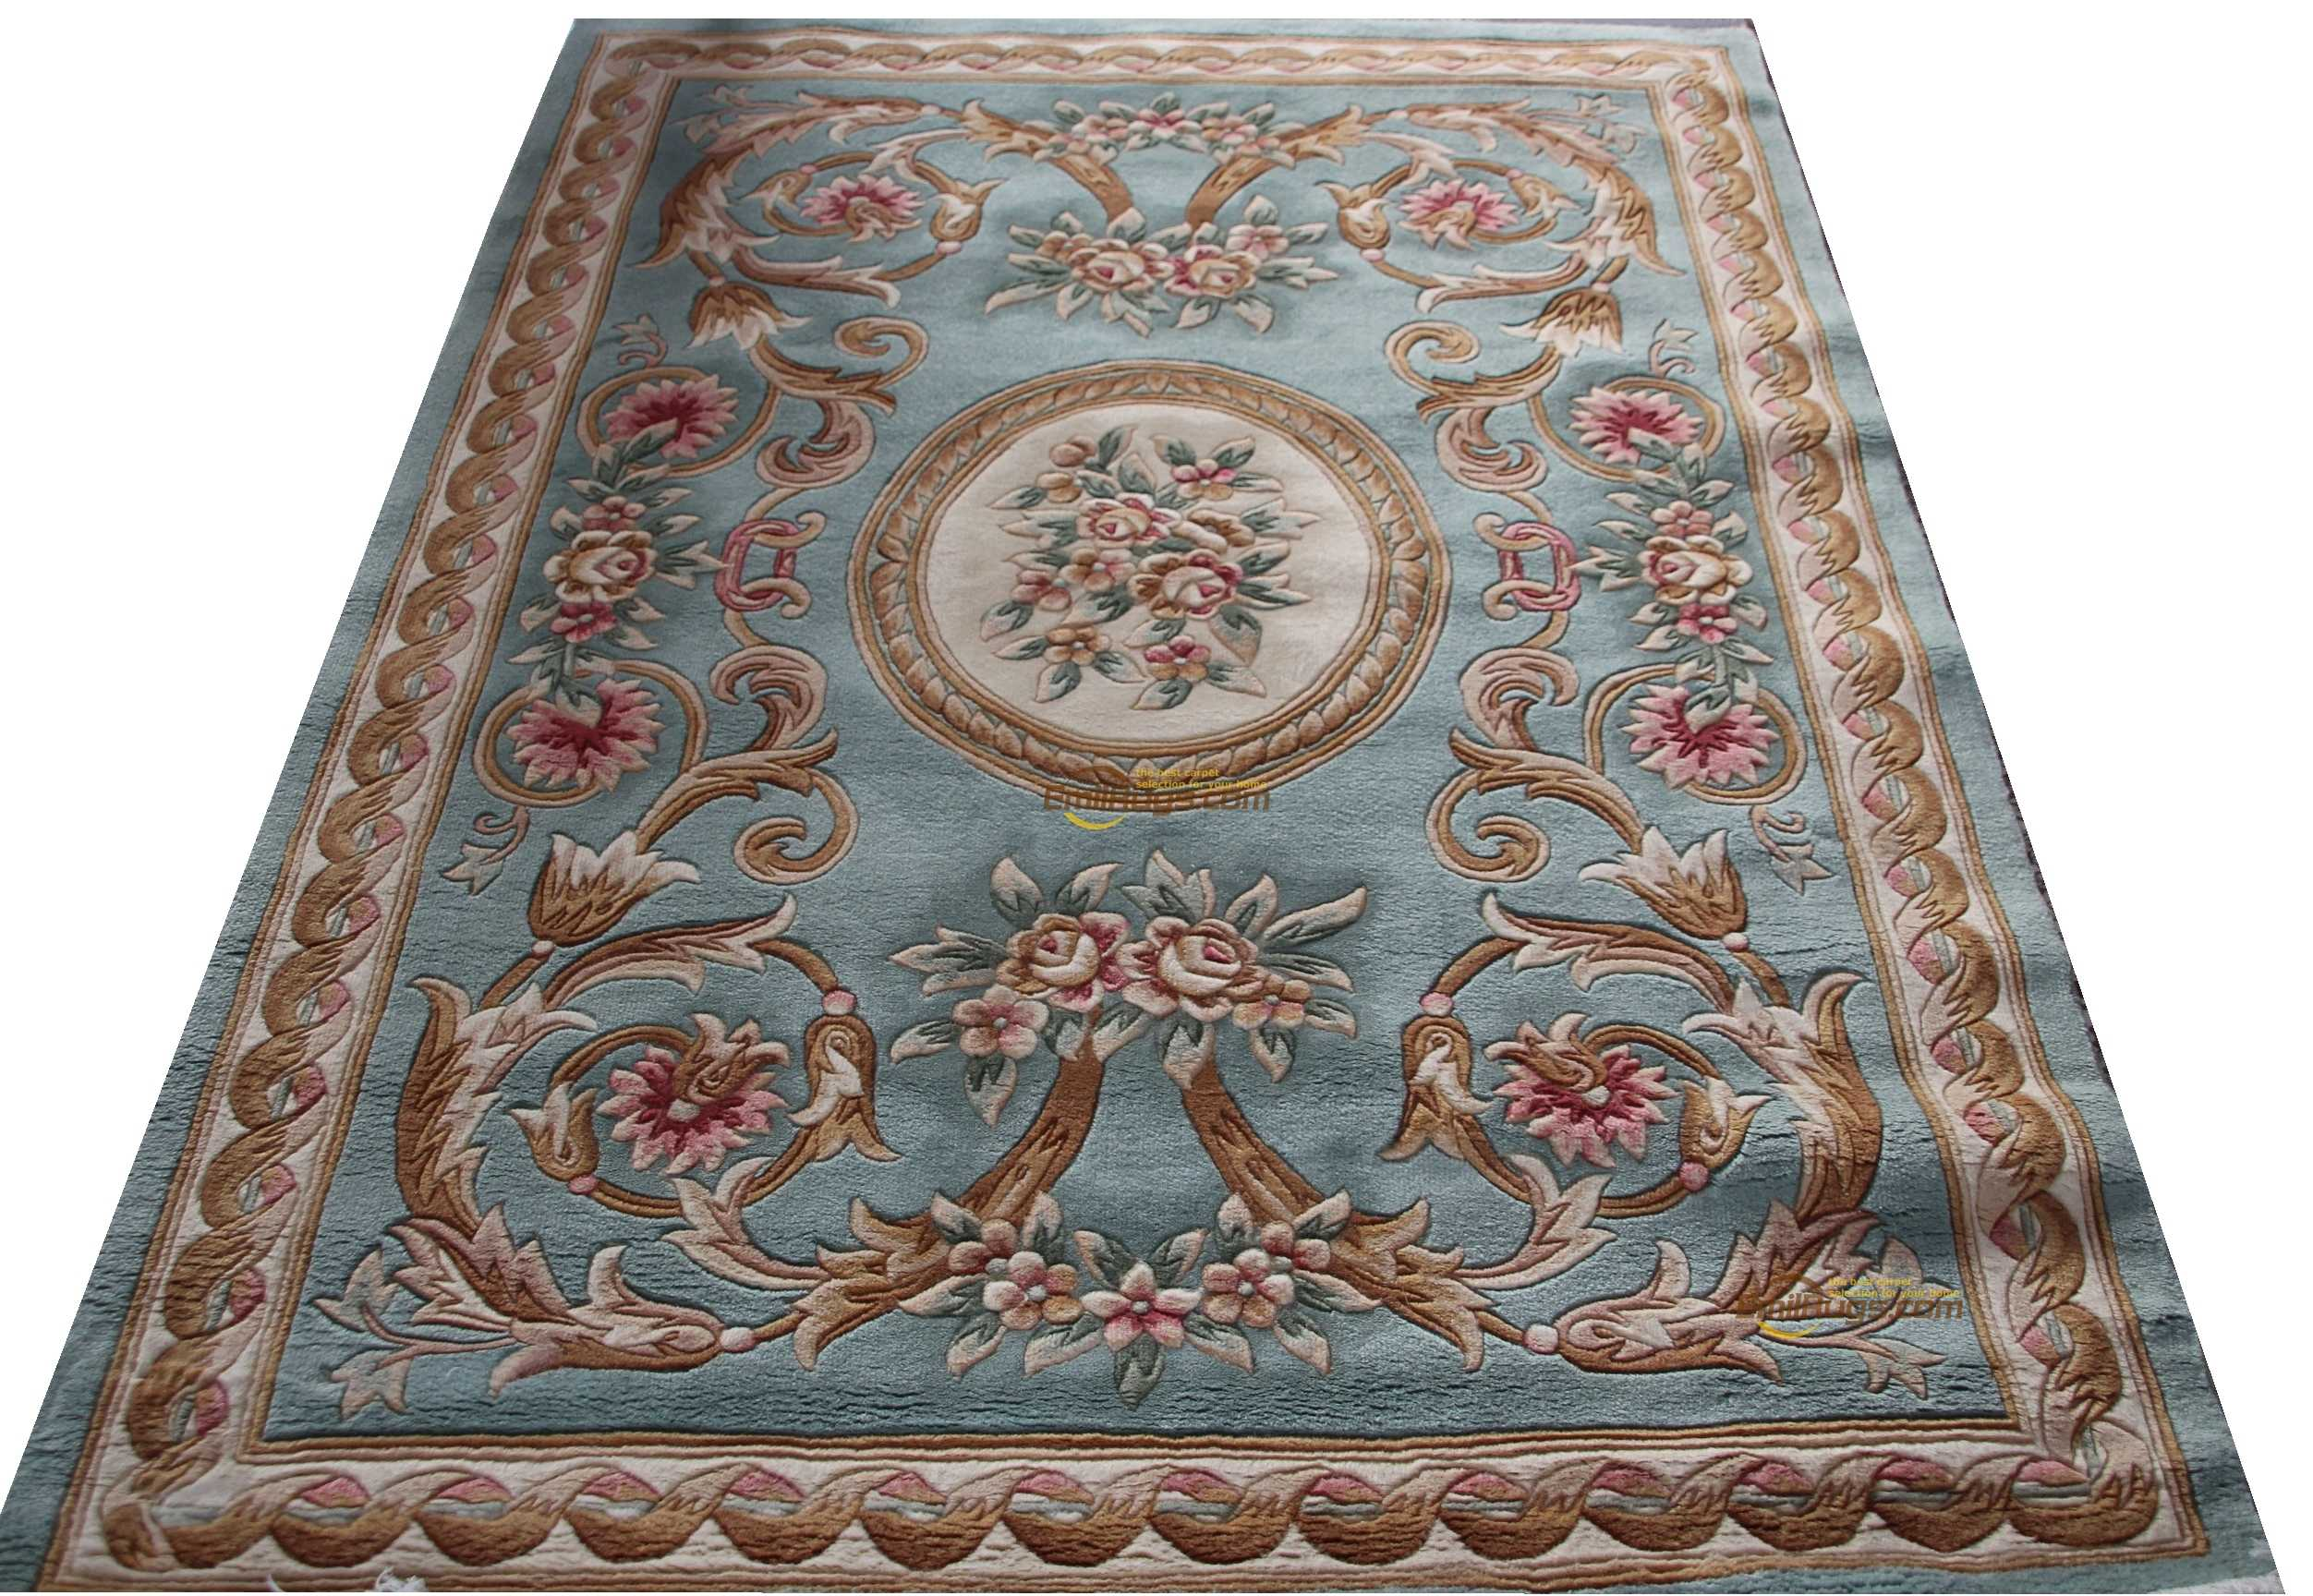 Carpet Handmade Traditional Savonnerie Inspired Needlepoint New Listing Carved Rectangular New Carpet Wool Knitting Carpets